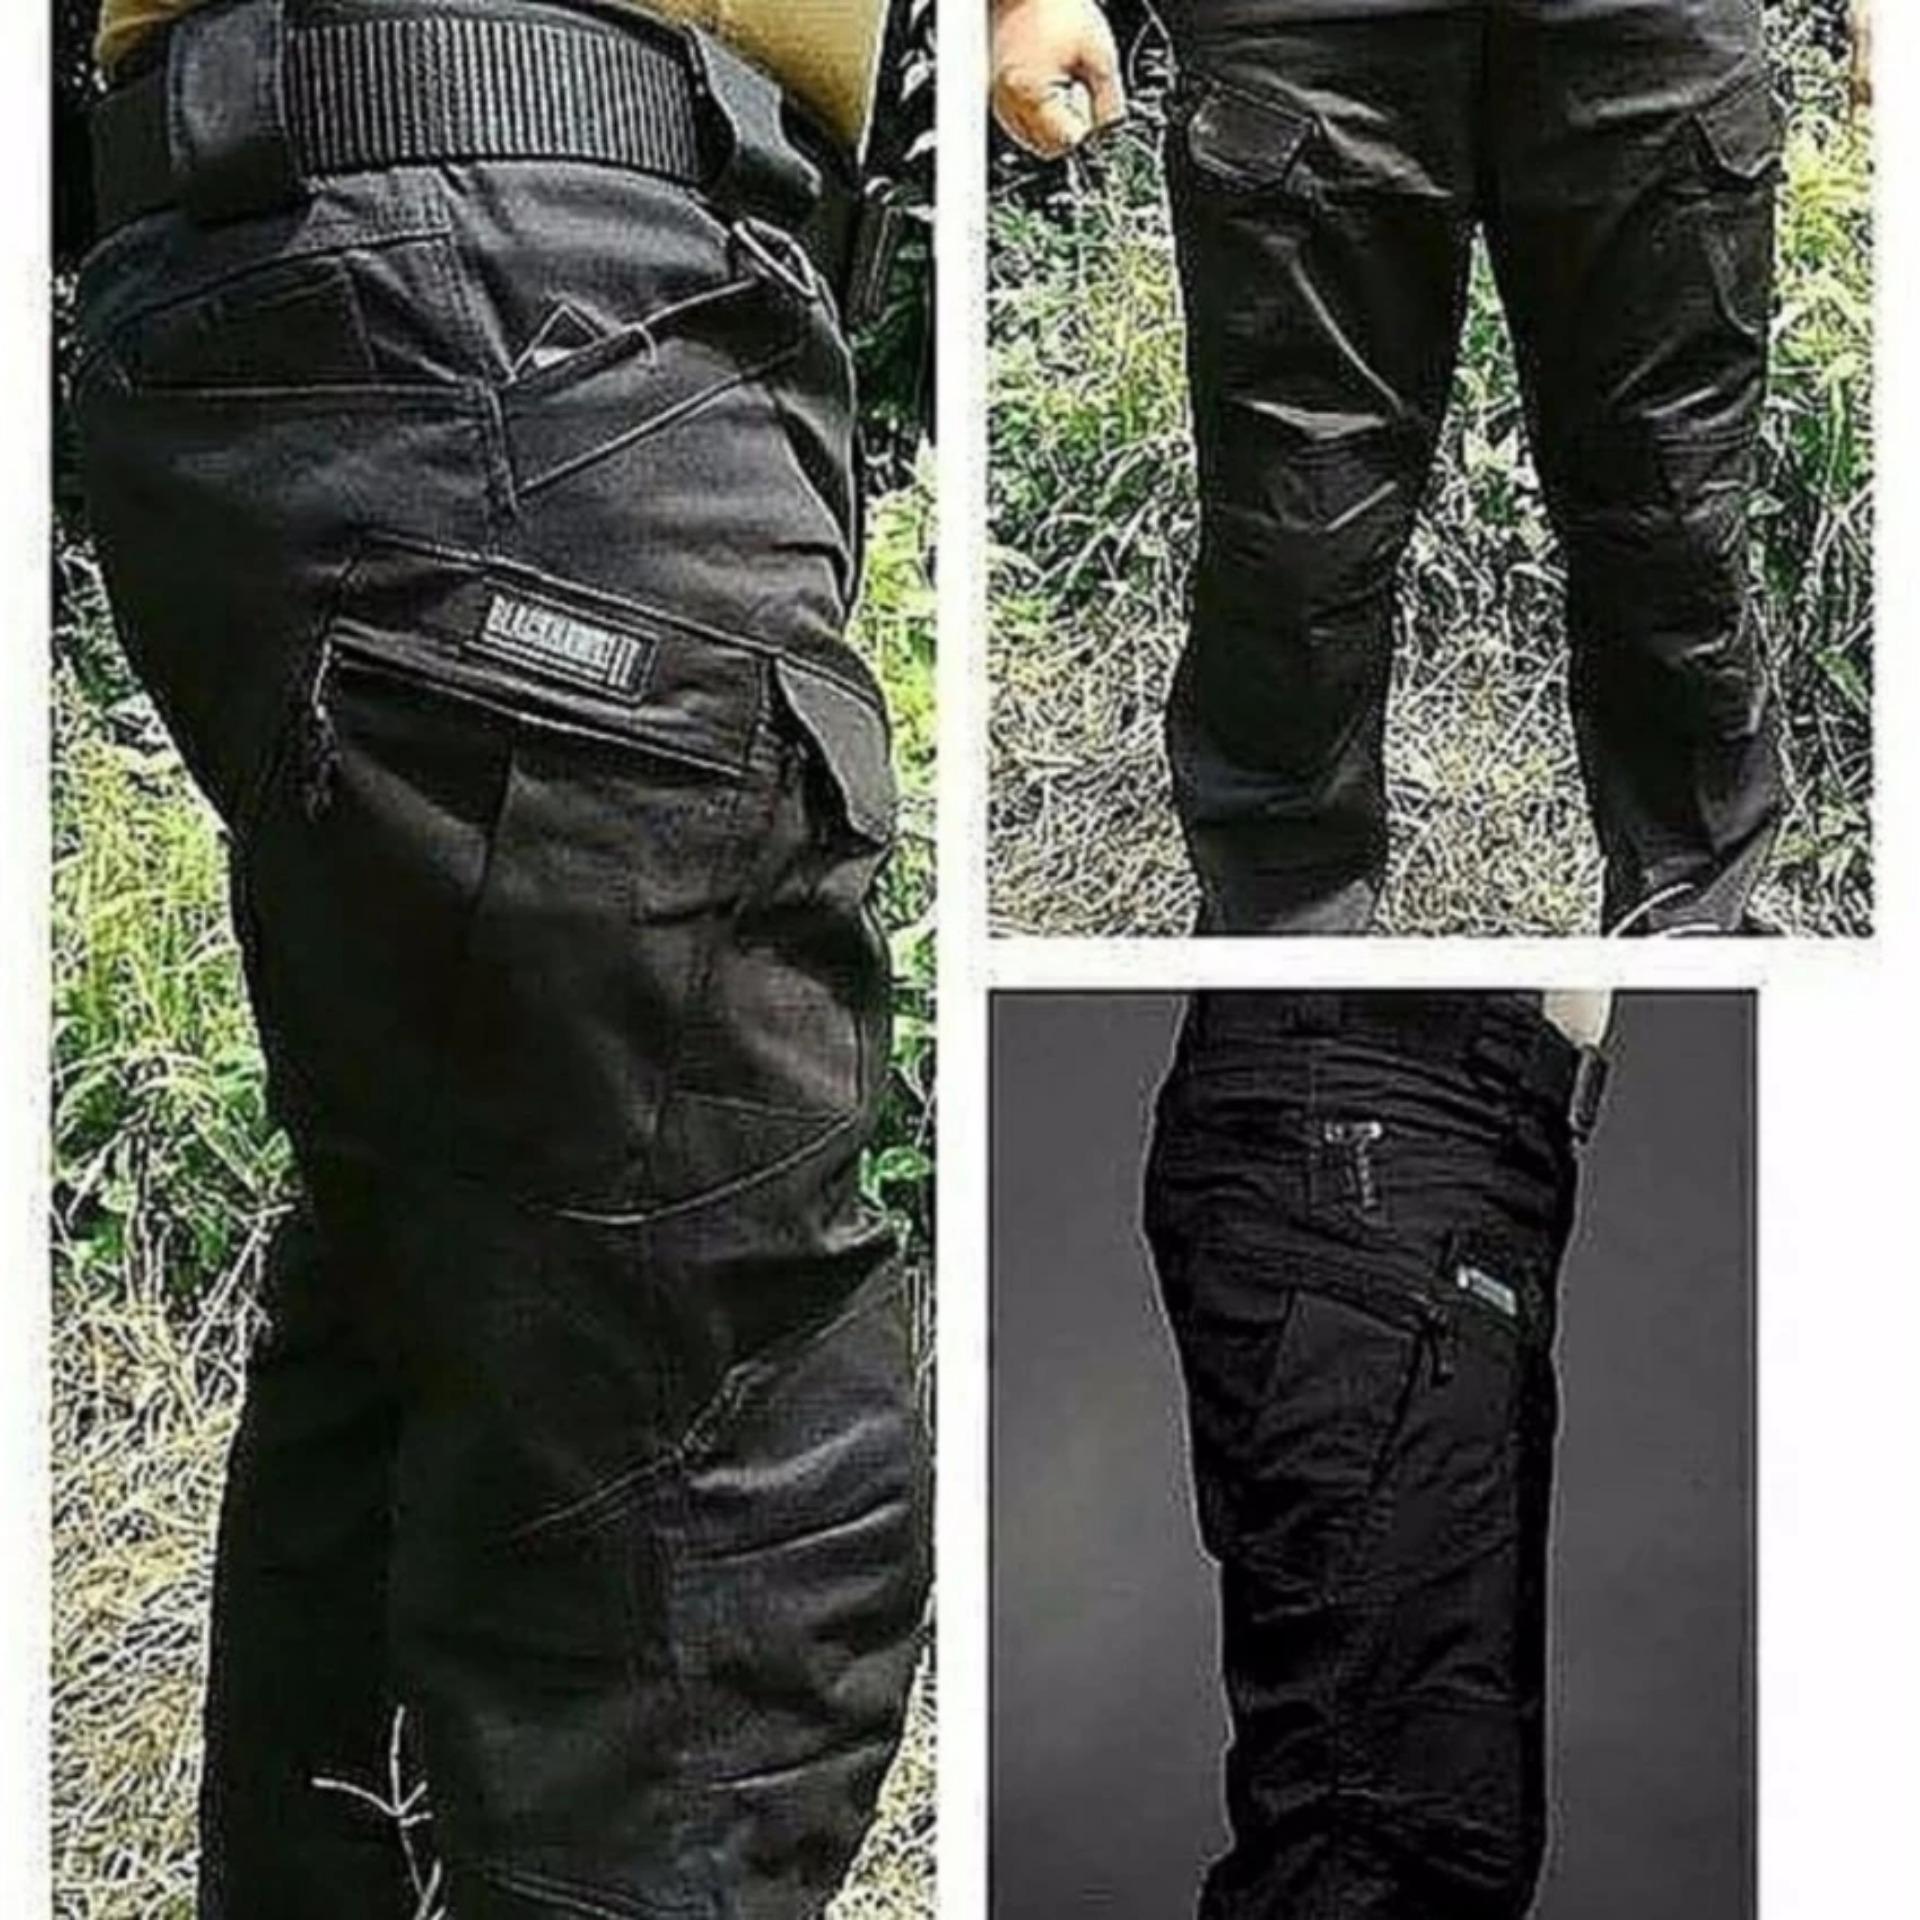 ... RXS Tactical Blackhawk Celana Panjang Pria - Hitam ...